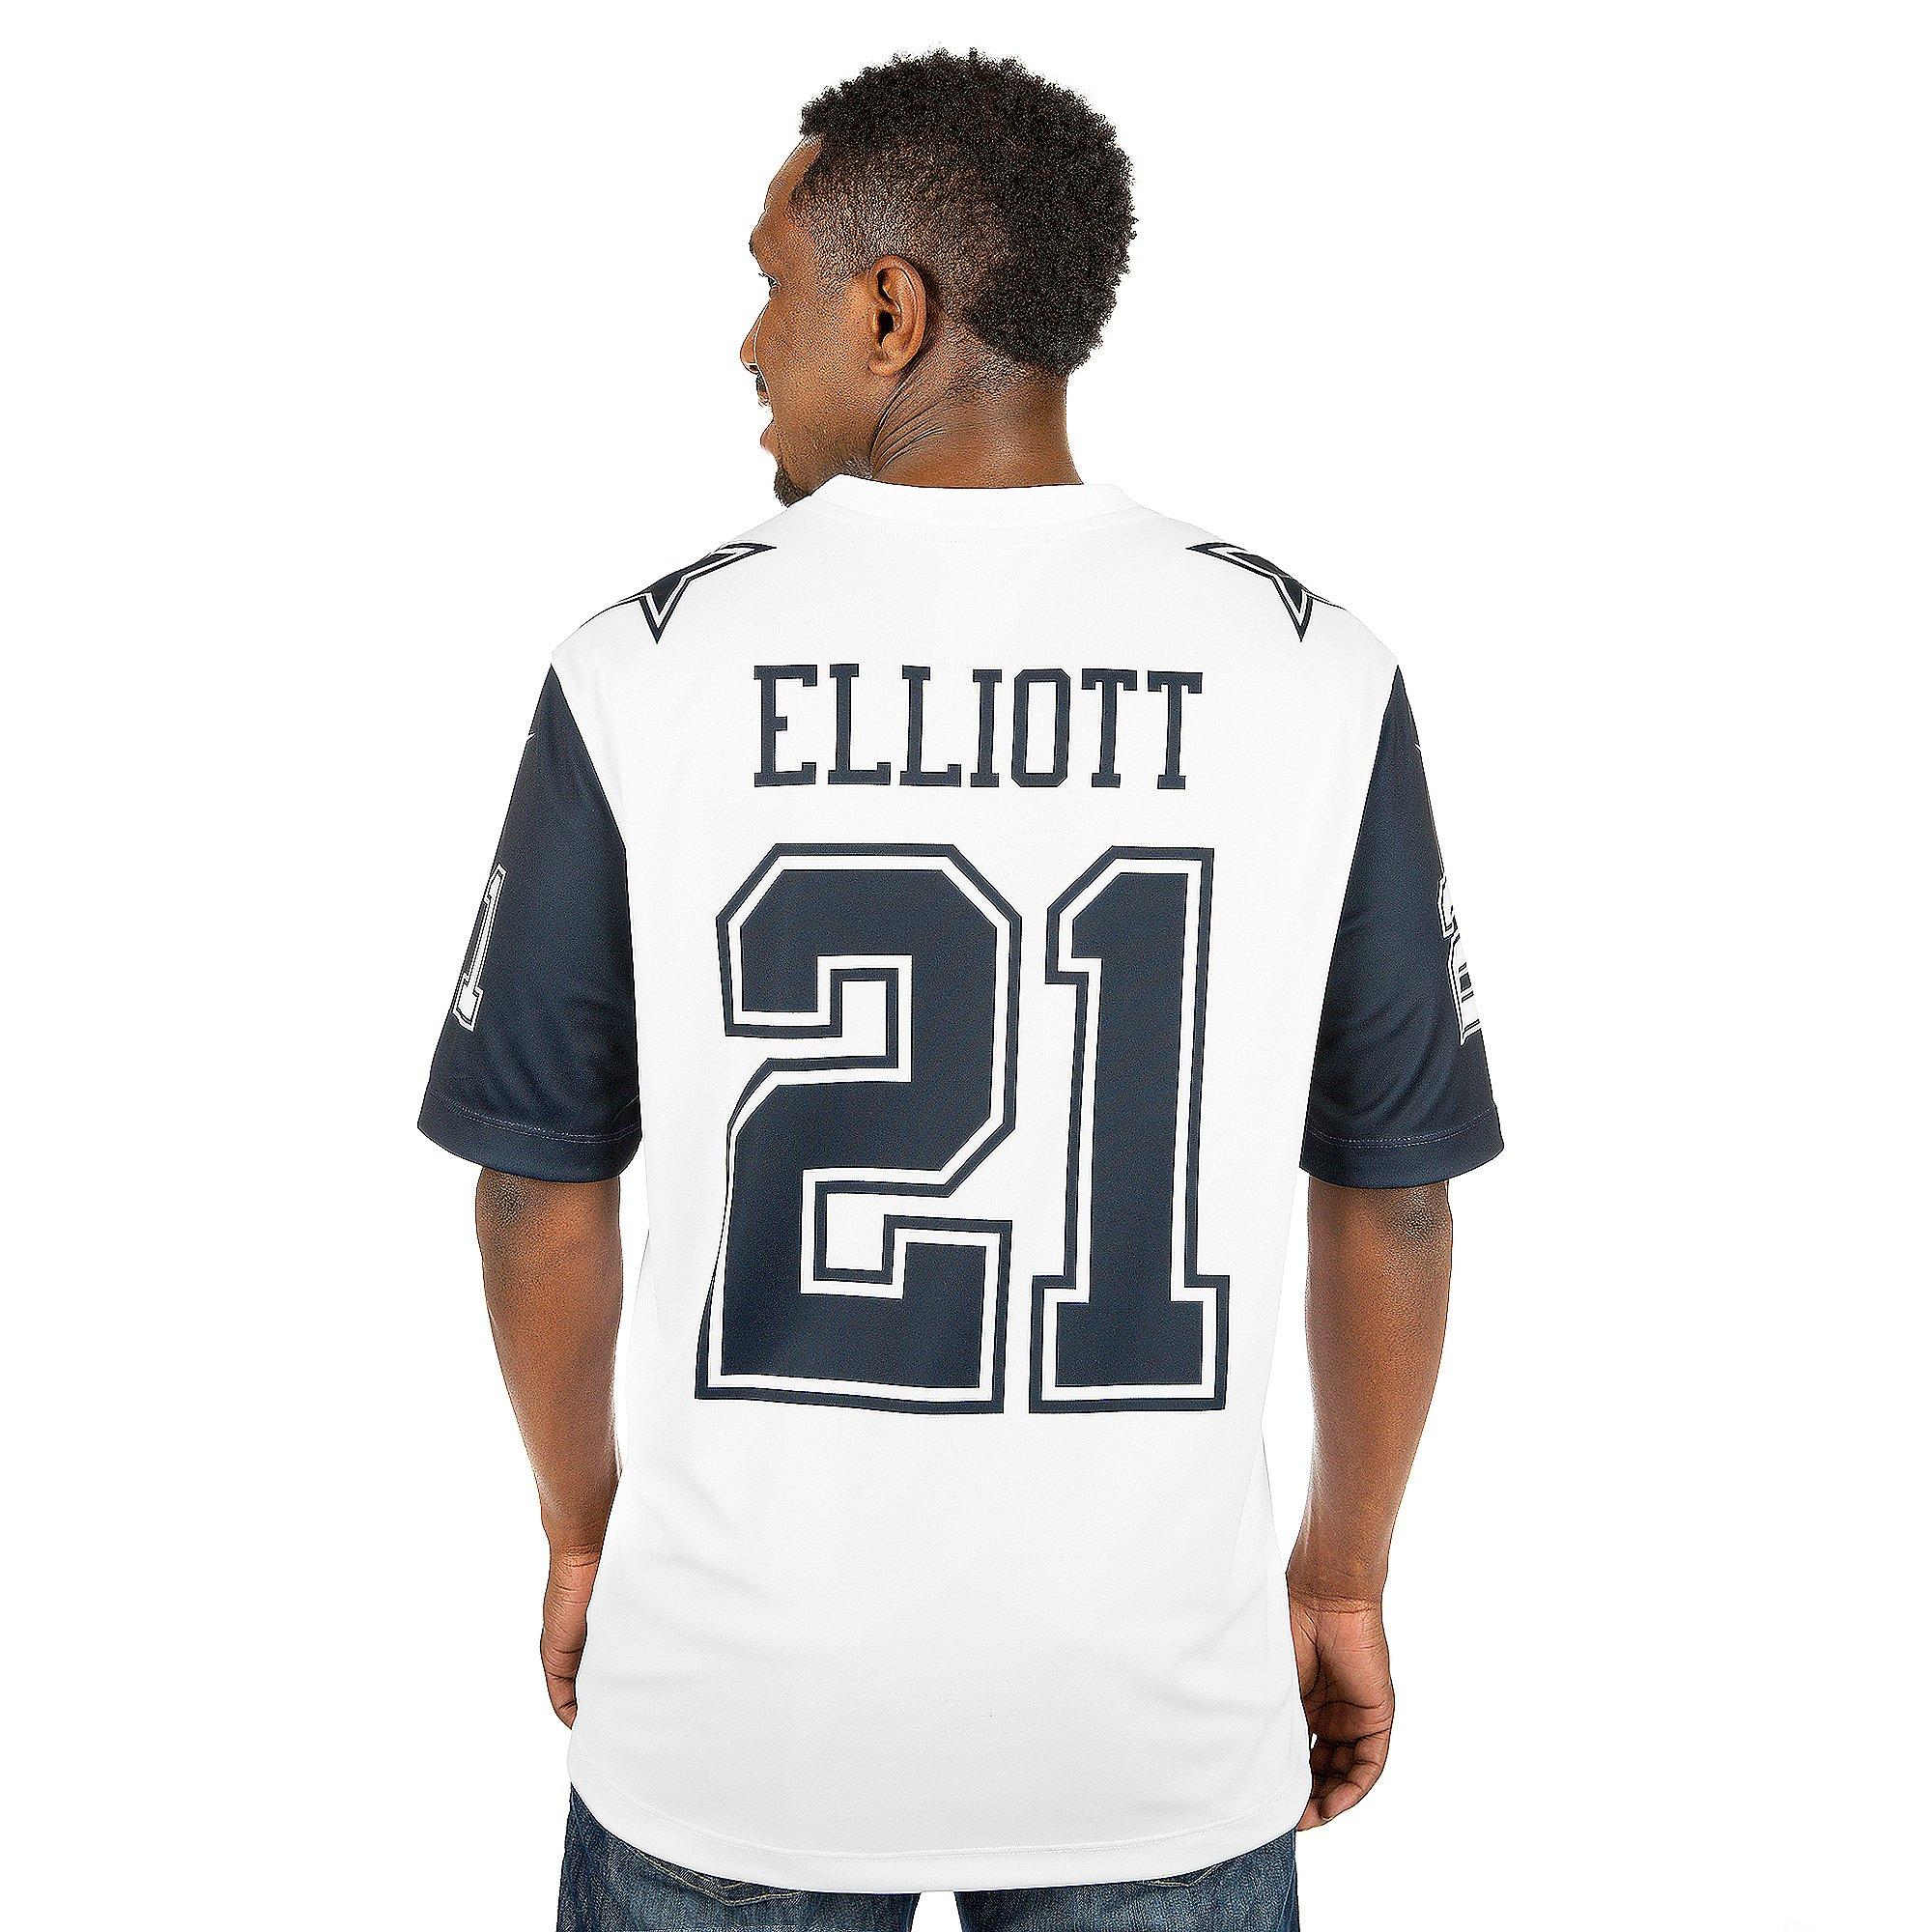 elliott color rush jersey